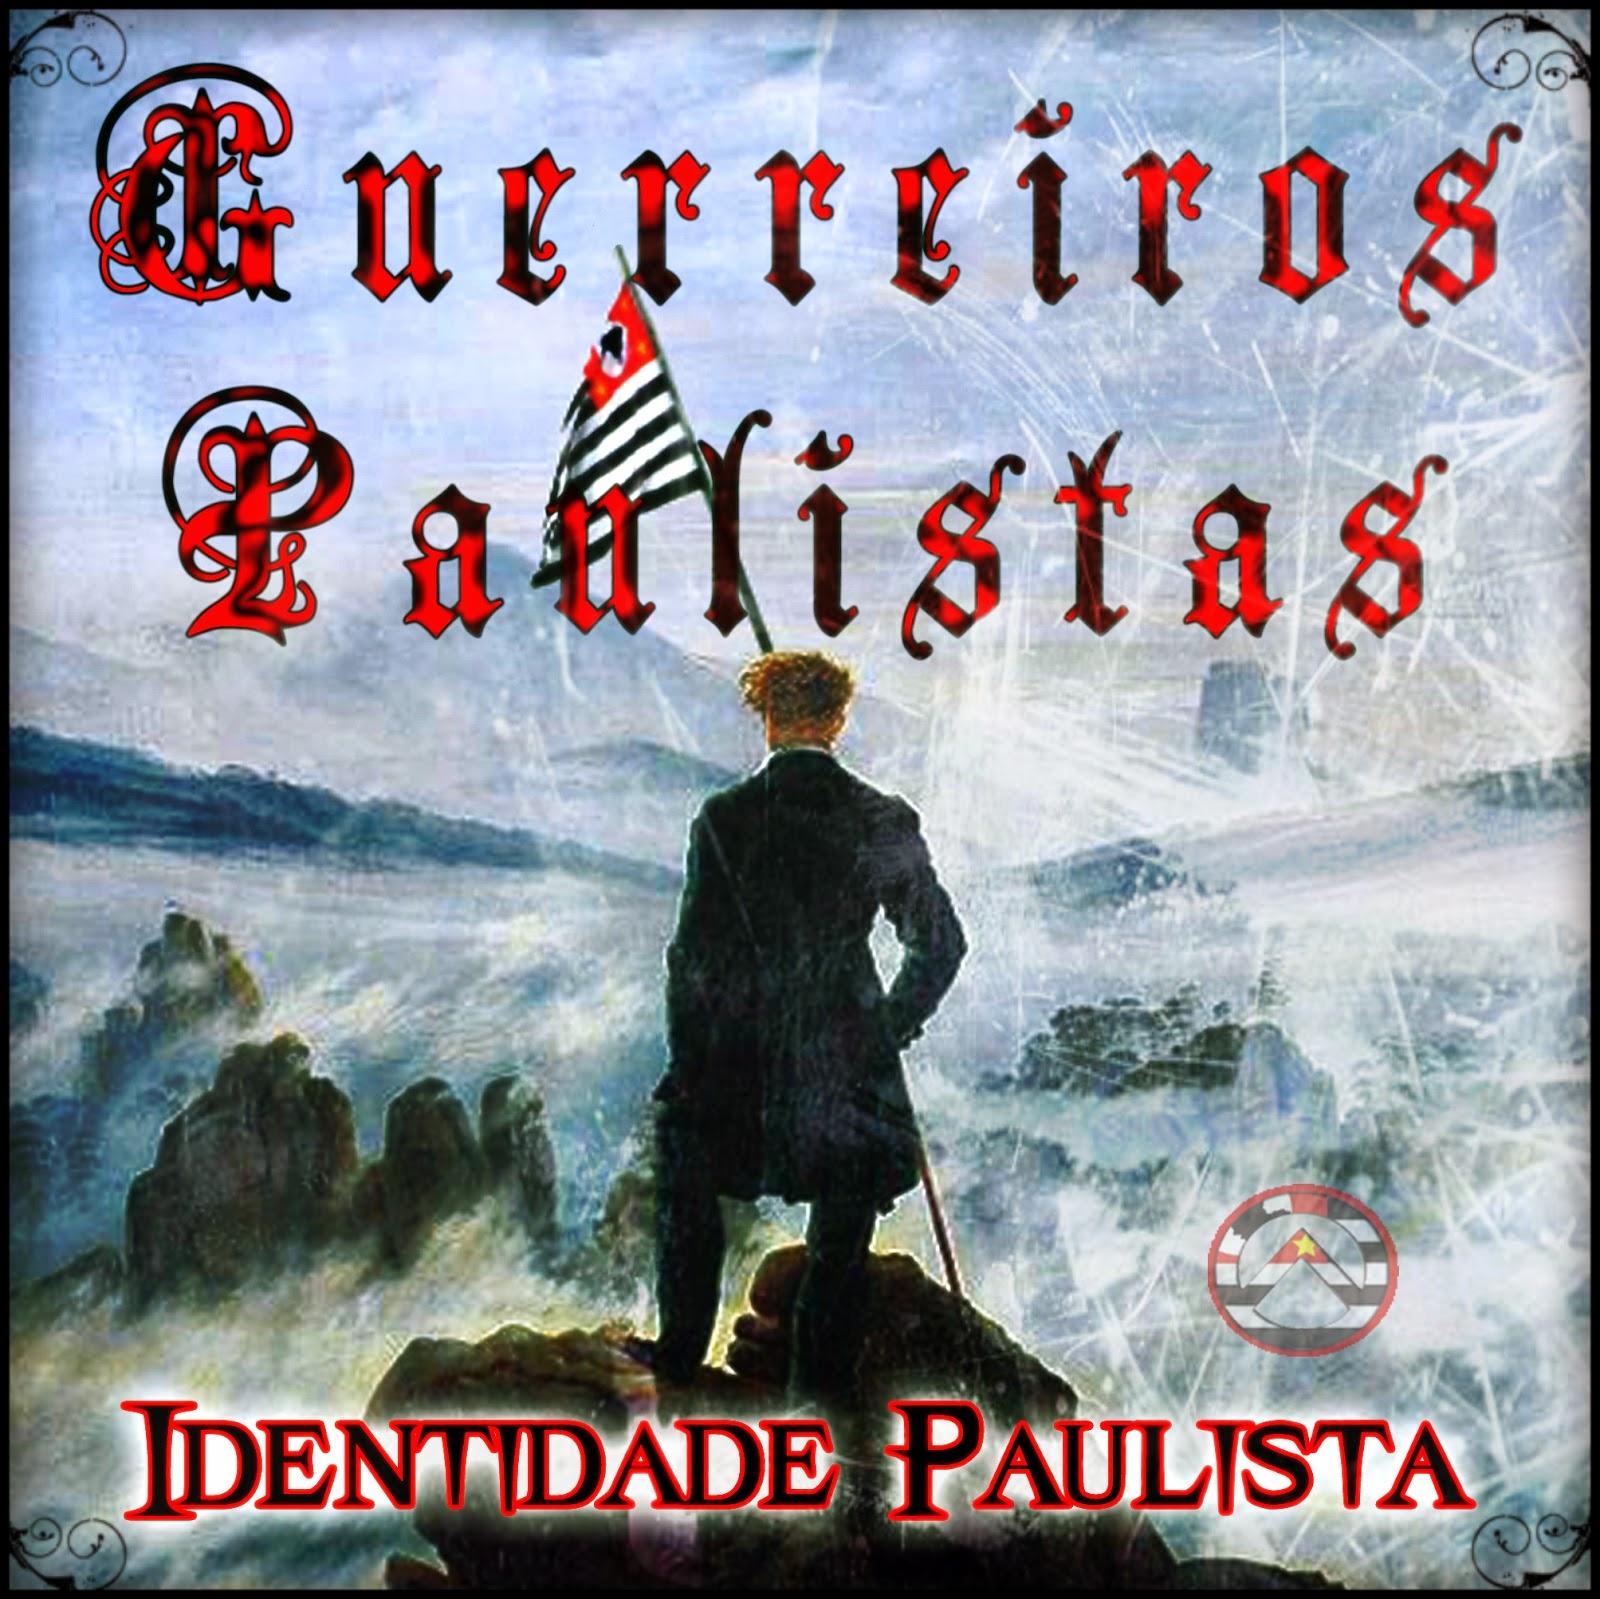 Paulista Identity Identidade Paulista Guerreiros Paulistas 1932 MSPI Monarquia Brasil Brazil Monarchy Traditionalist Traditionalism Tradicionalism Traditional Conservatism Burke  Neo Folk Neo-Folk